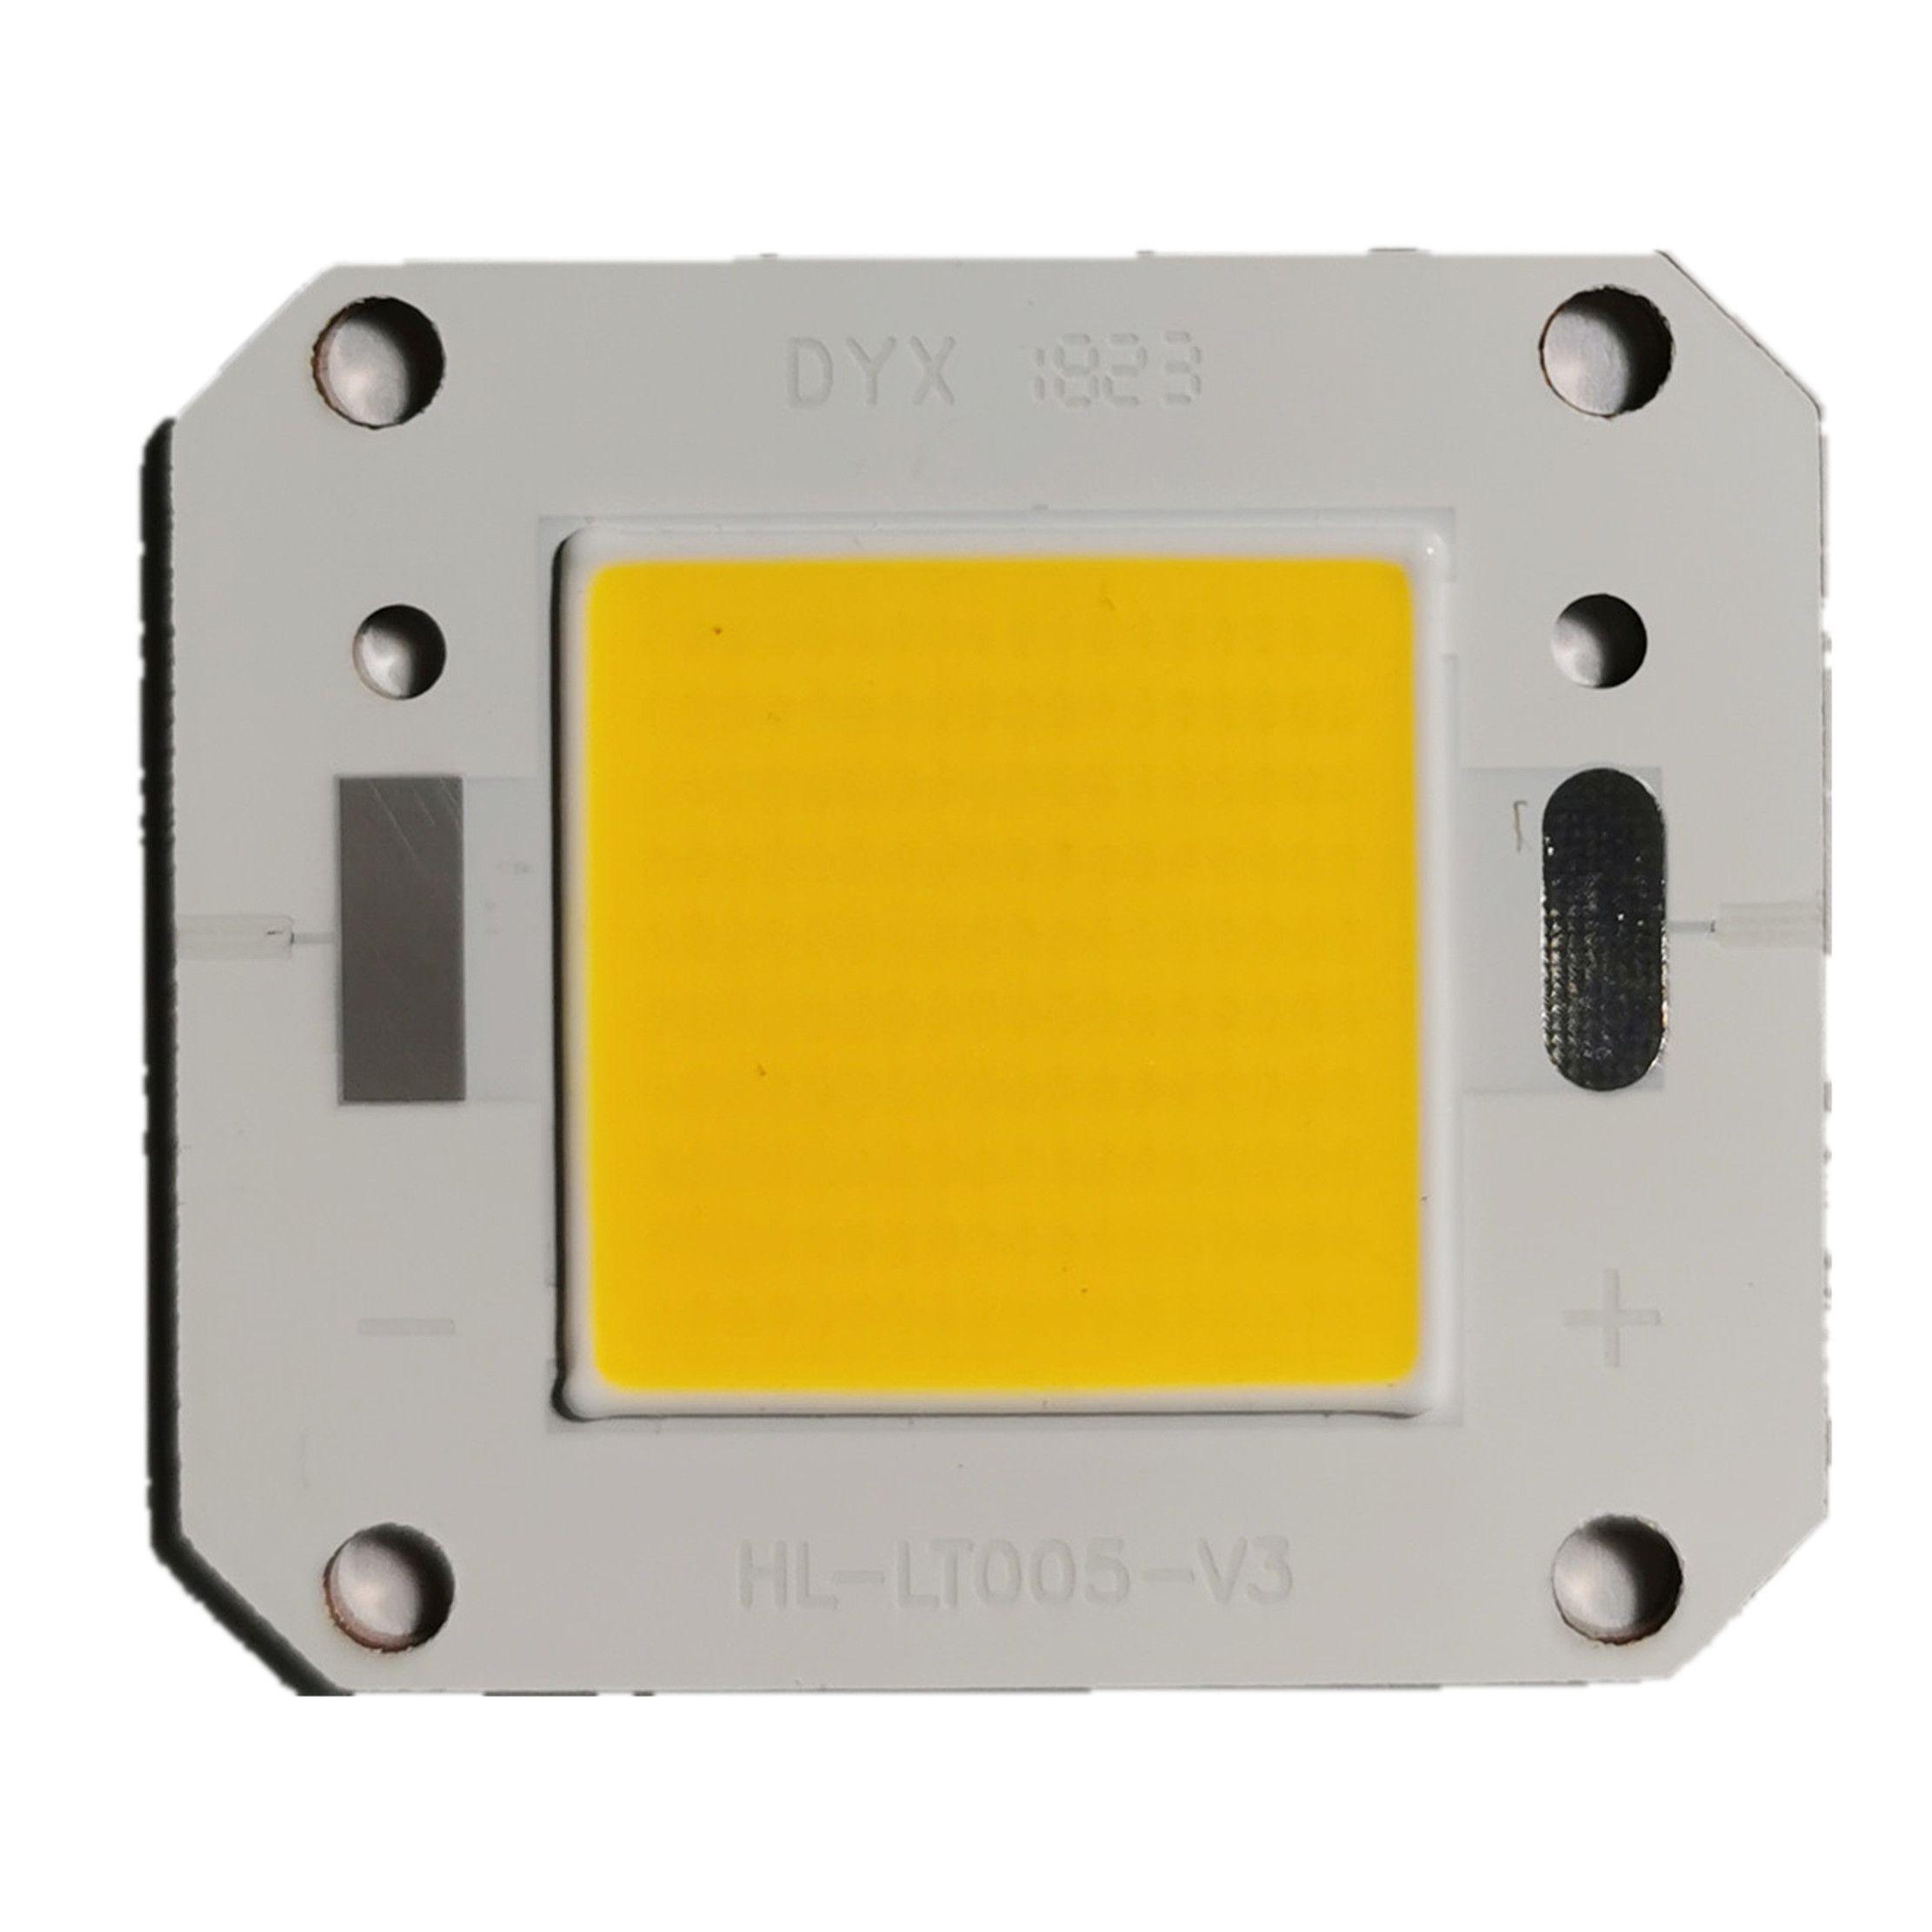 Lighting Accessories 6pcs Led Cob Beads Chip High Power 34v 36v 100w Need Driver Diy For Floodlight Lamp Spot Light Led Cob In 2020 Light Accessories Led Lights Led